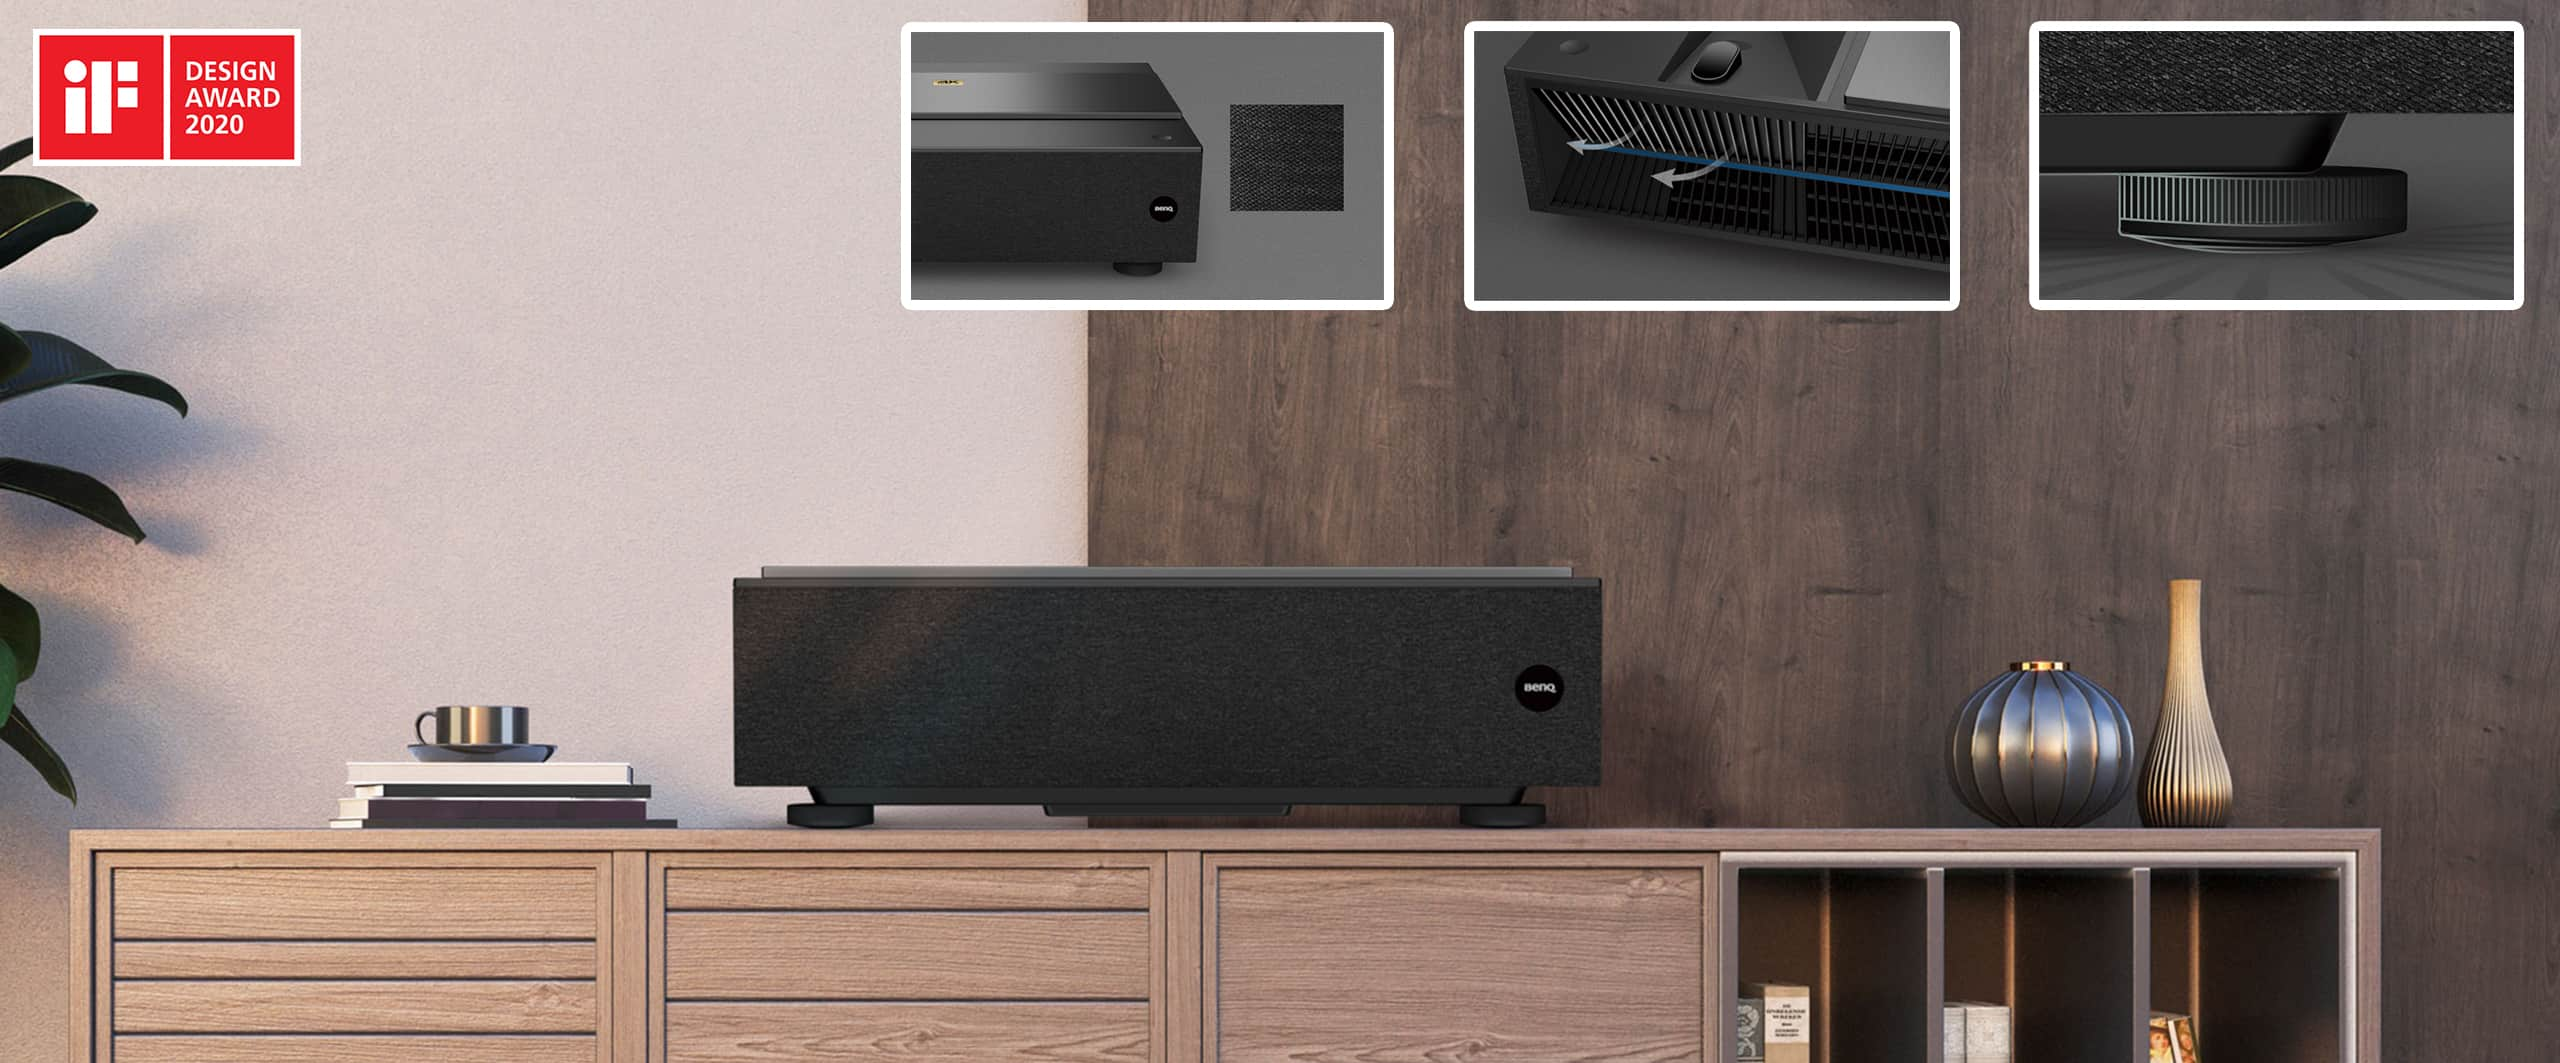 Proiettore Home Cinema a tiro ultra corto laser, BenQ V6000